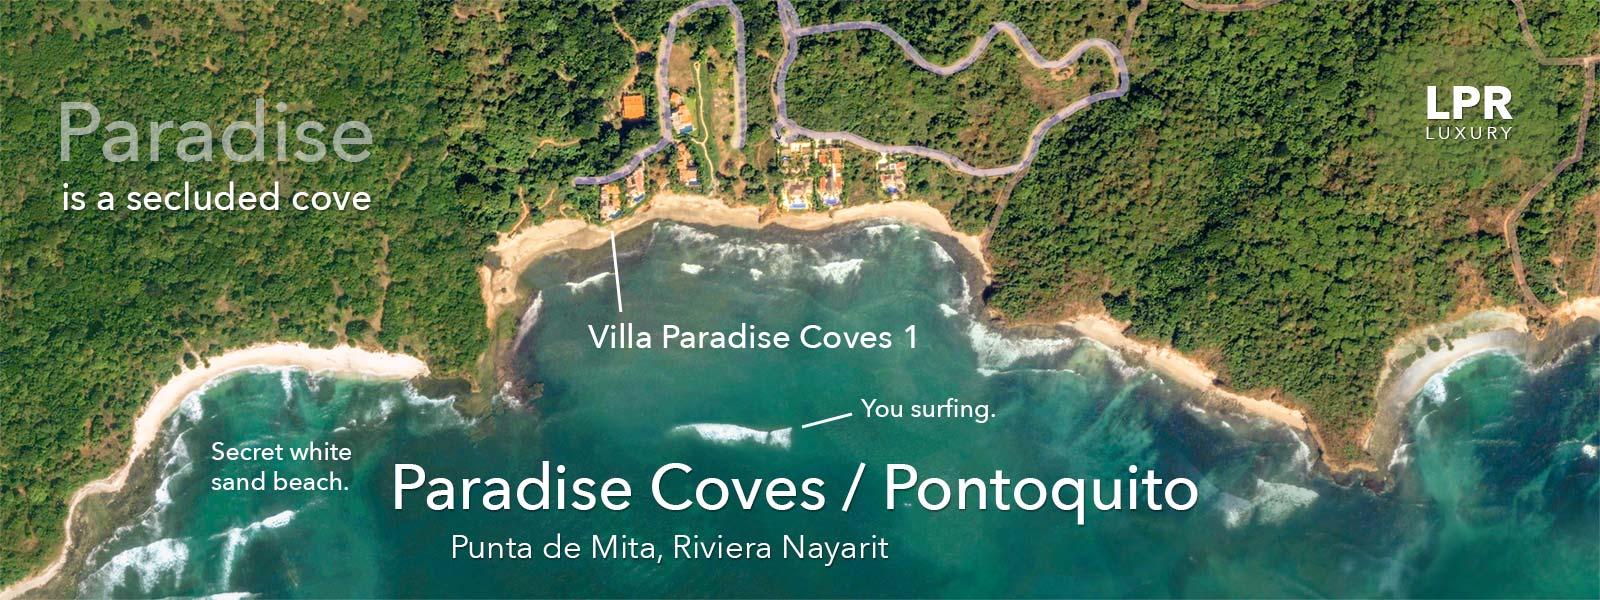 Villa Paradise Coves 1 - Luxury Punta de Mita Real Estate and Vacation Rentals